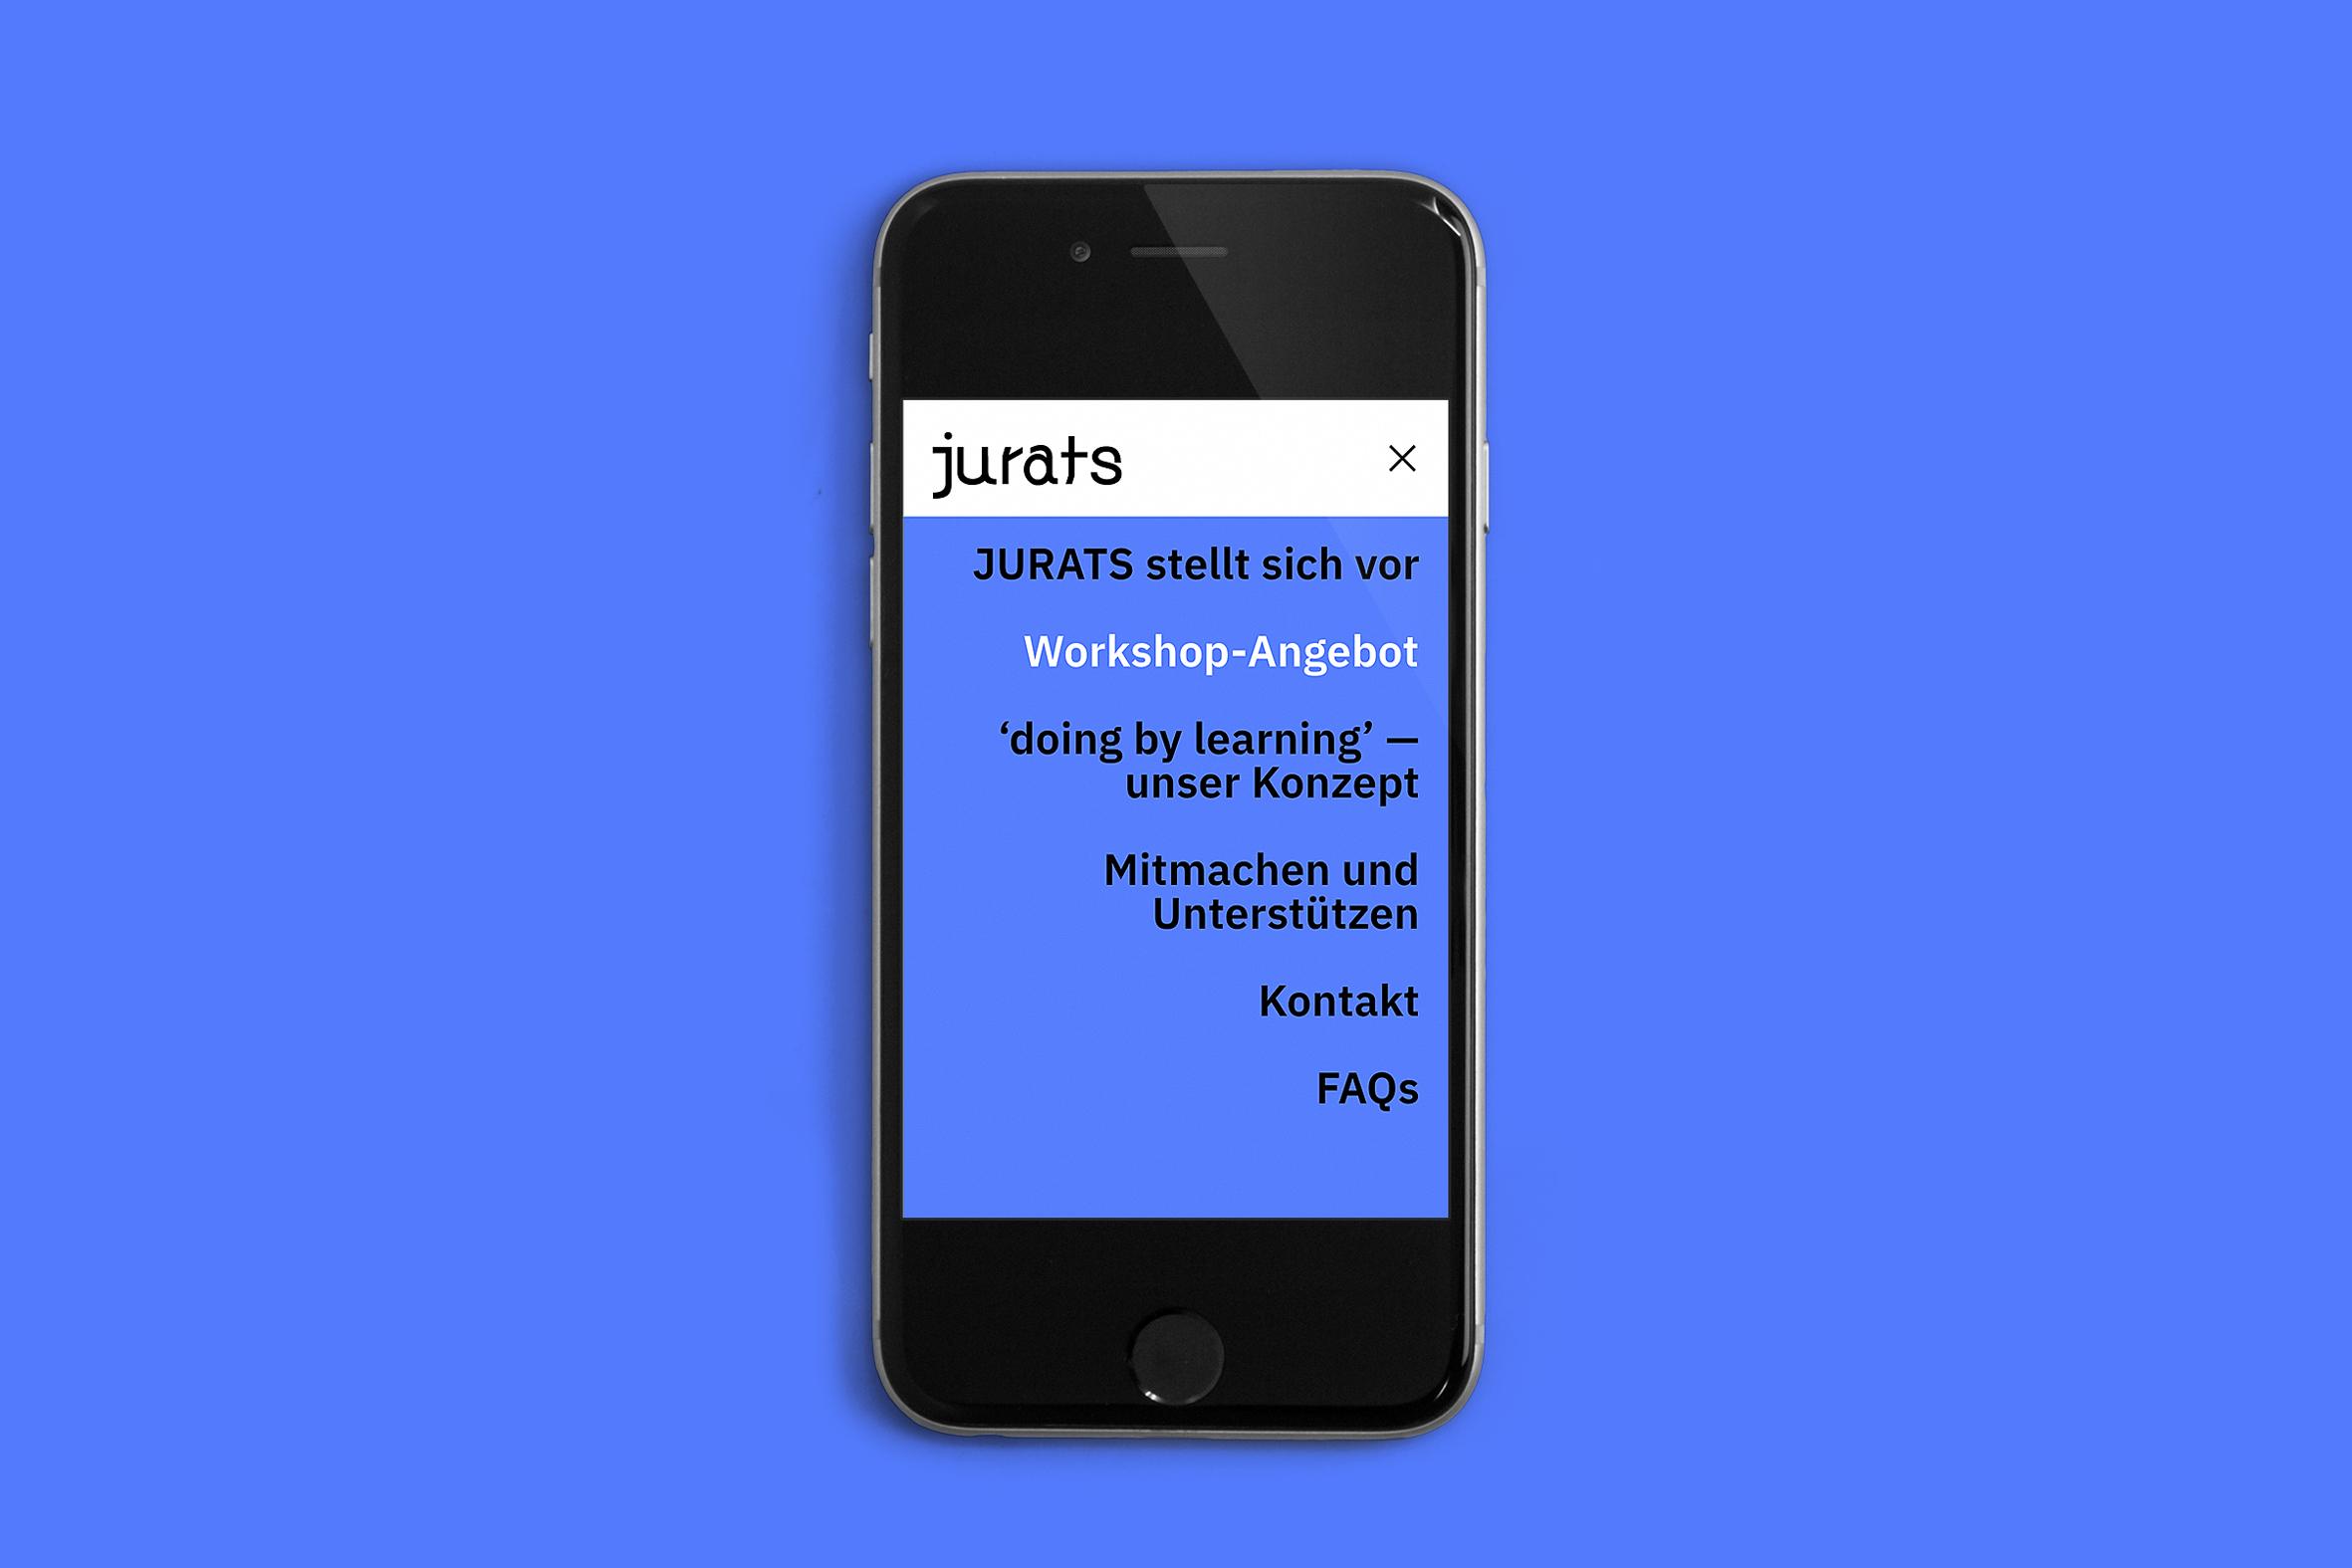 JURATS_Smartphone